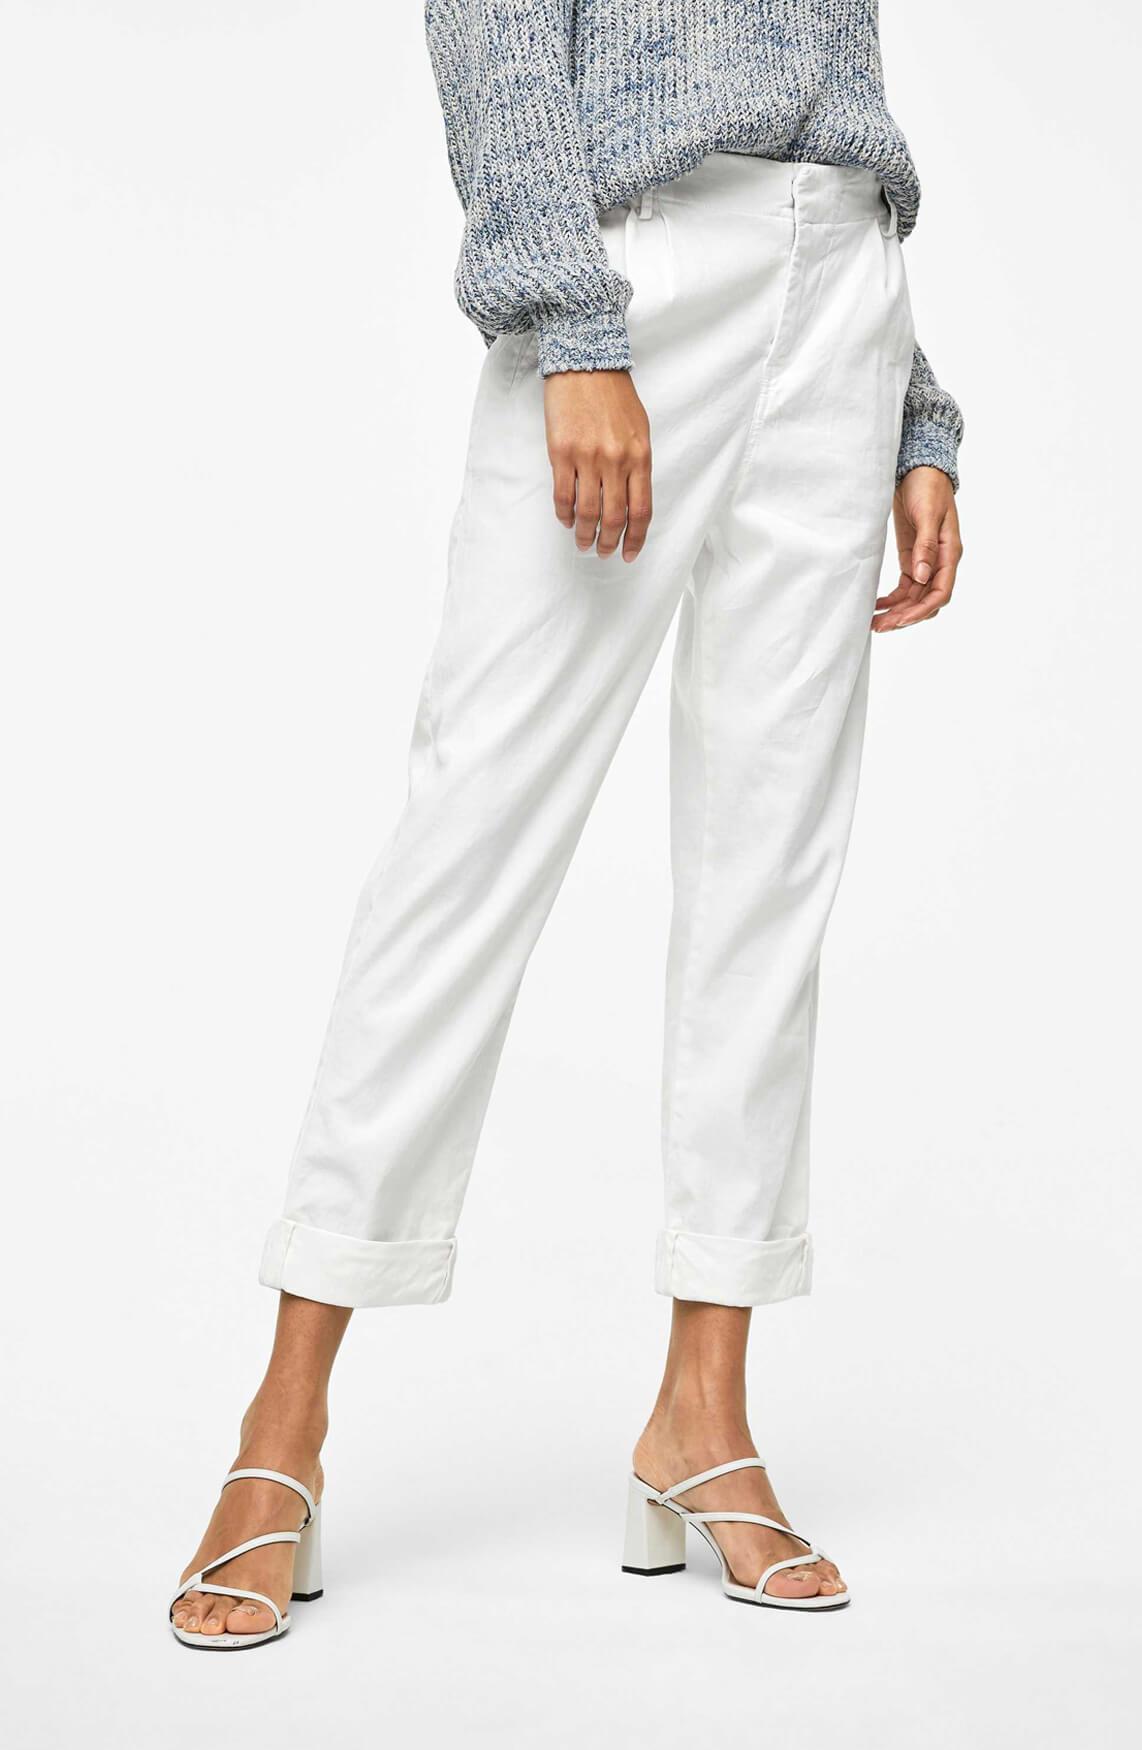 Drykorn Dames Dispatch linnen broek wit